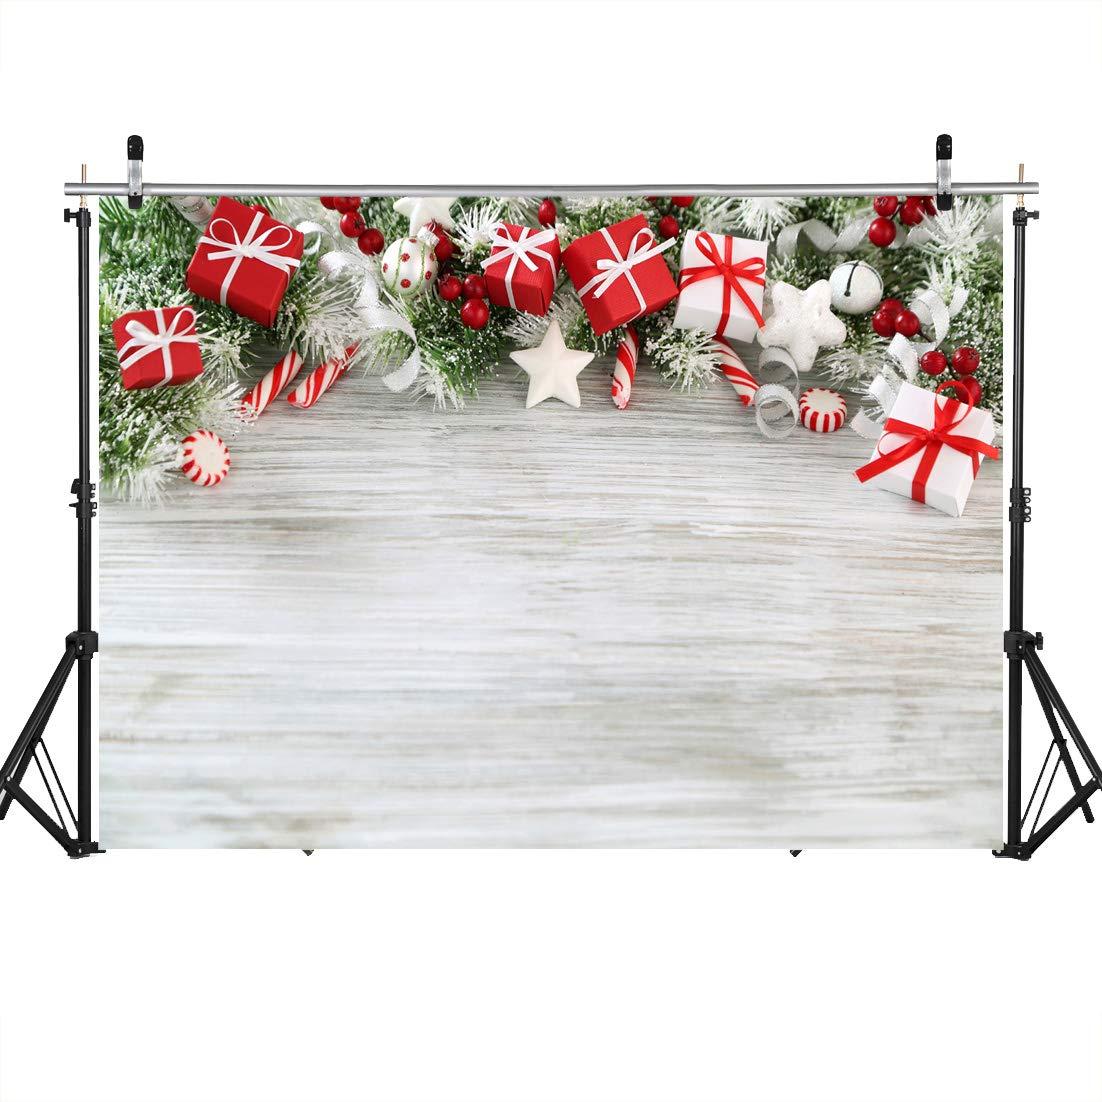 LYWYGG 7x5ft Fondo de Pared de Madera Fotograf/ía de Navidad Contextos para fot/ógrafos White Snow Photo Background for Studio Photo Props CP-99